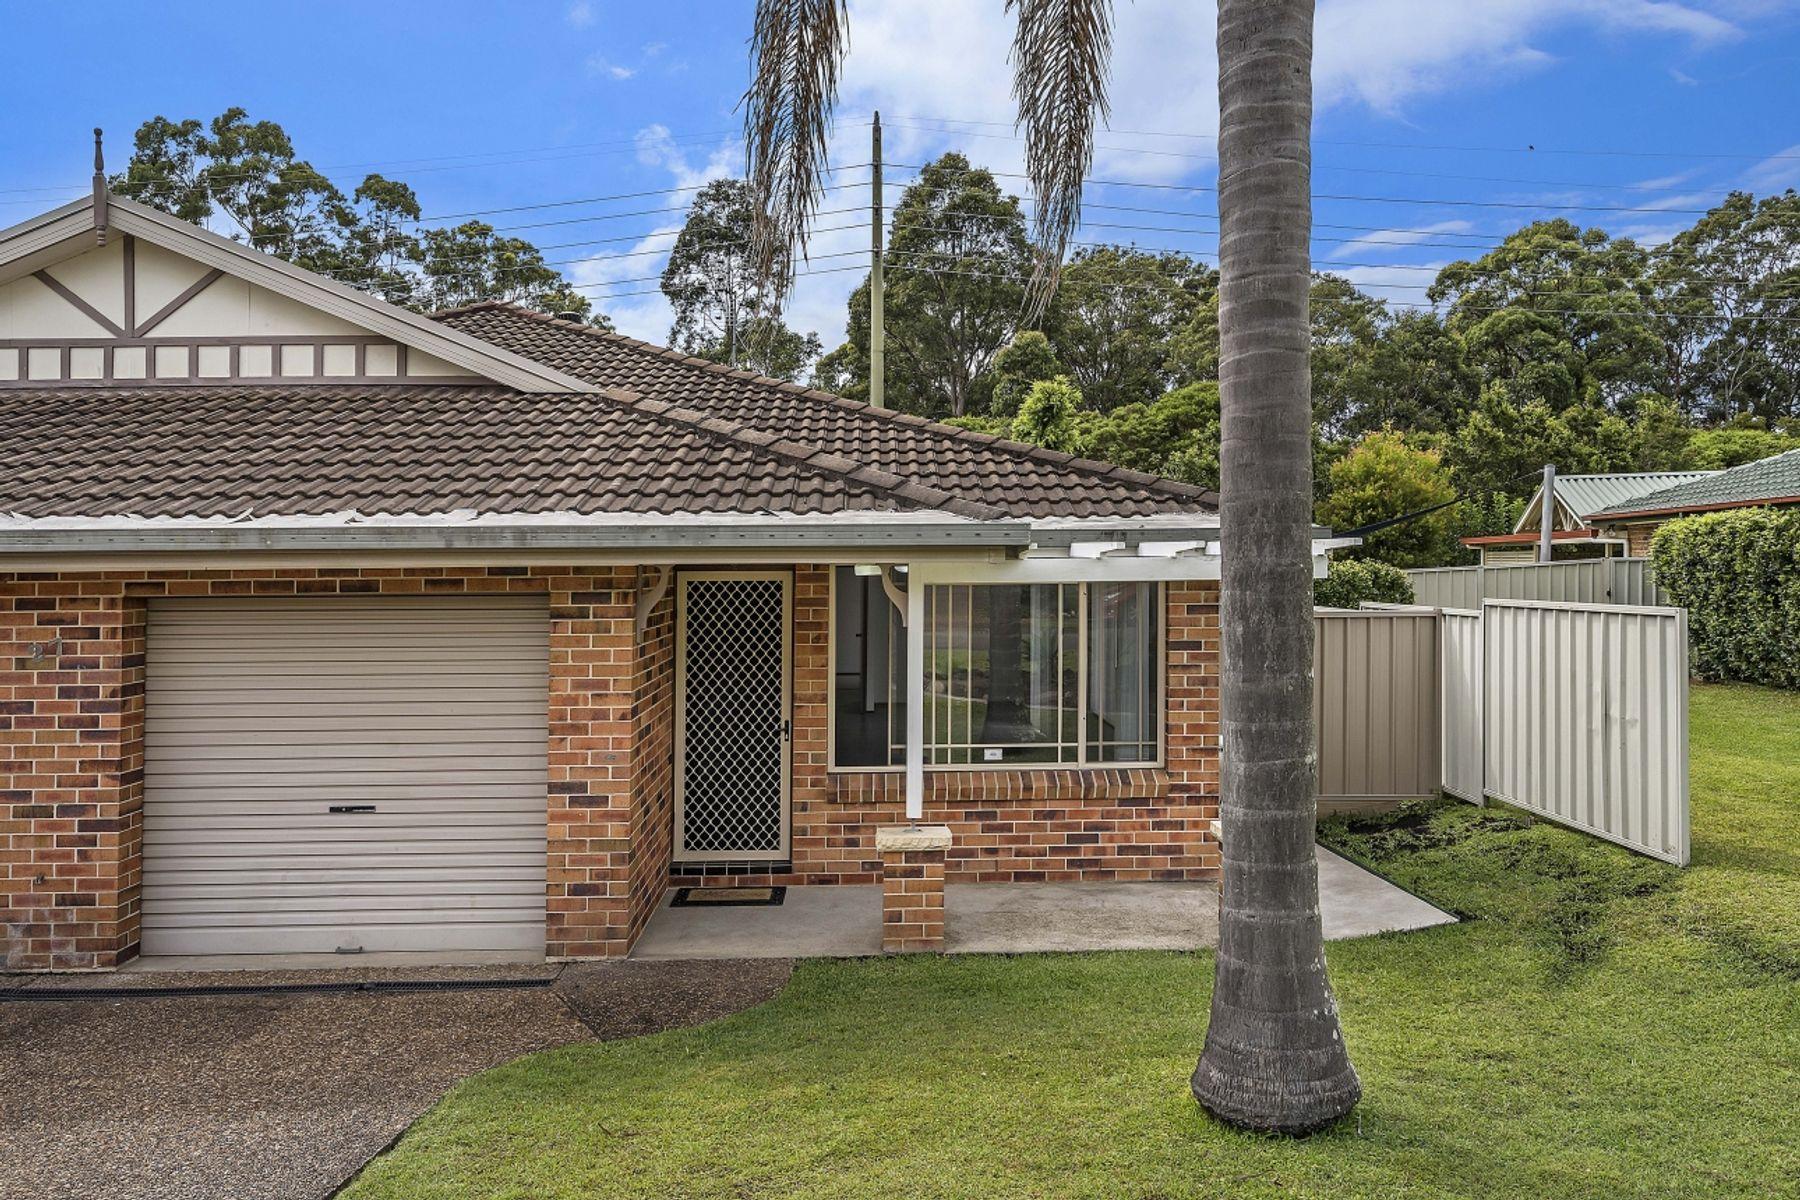 2/27 Eino Place, Eleebana, NSW 2282